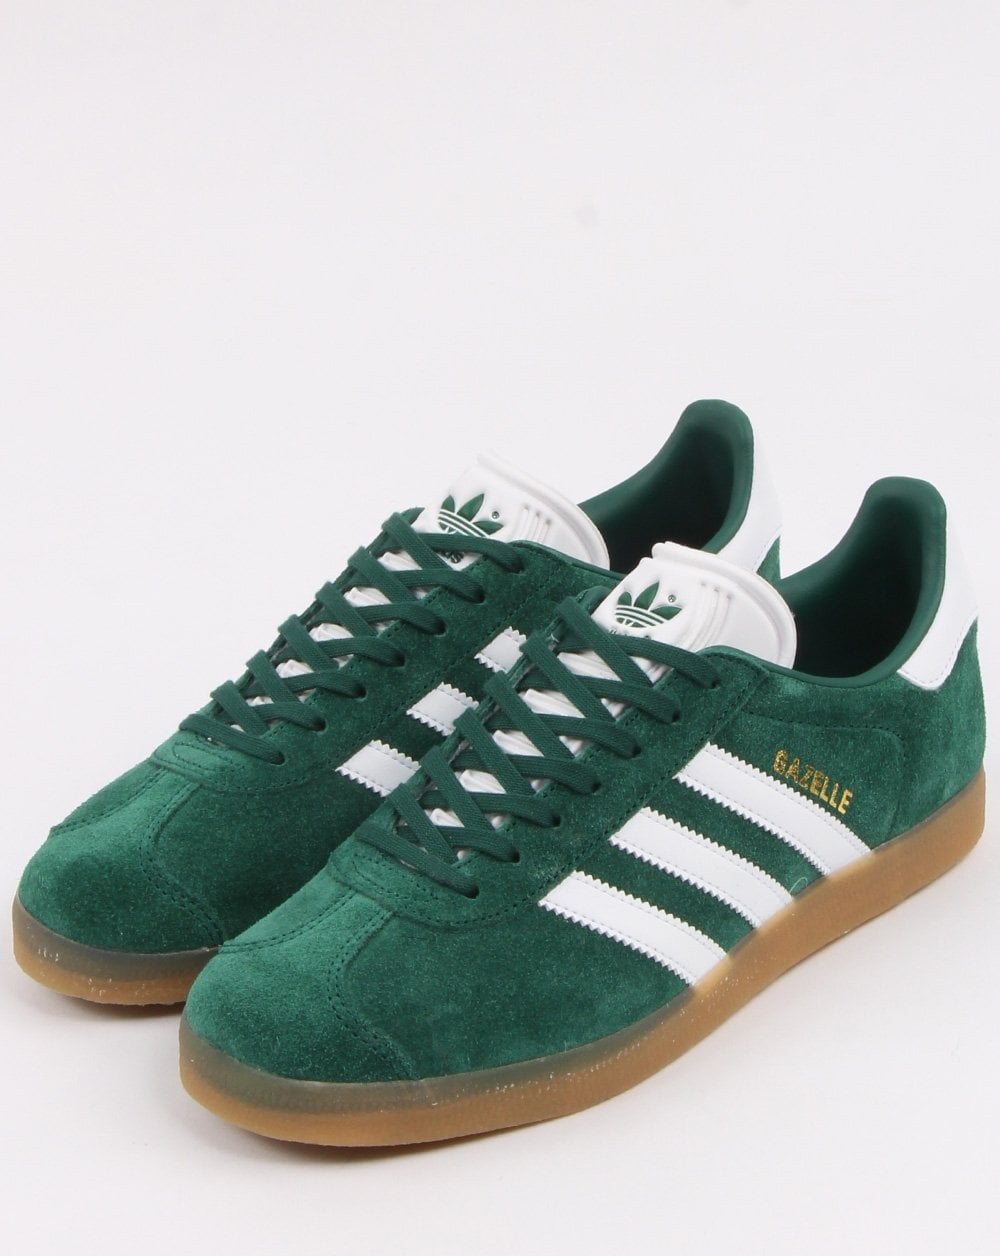 Adidas Gazelle Trainers Green/White/Gum